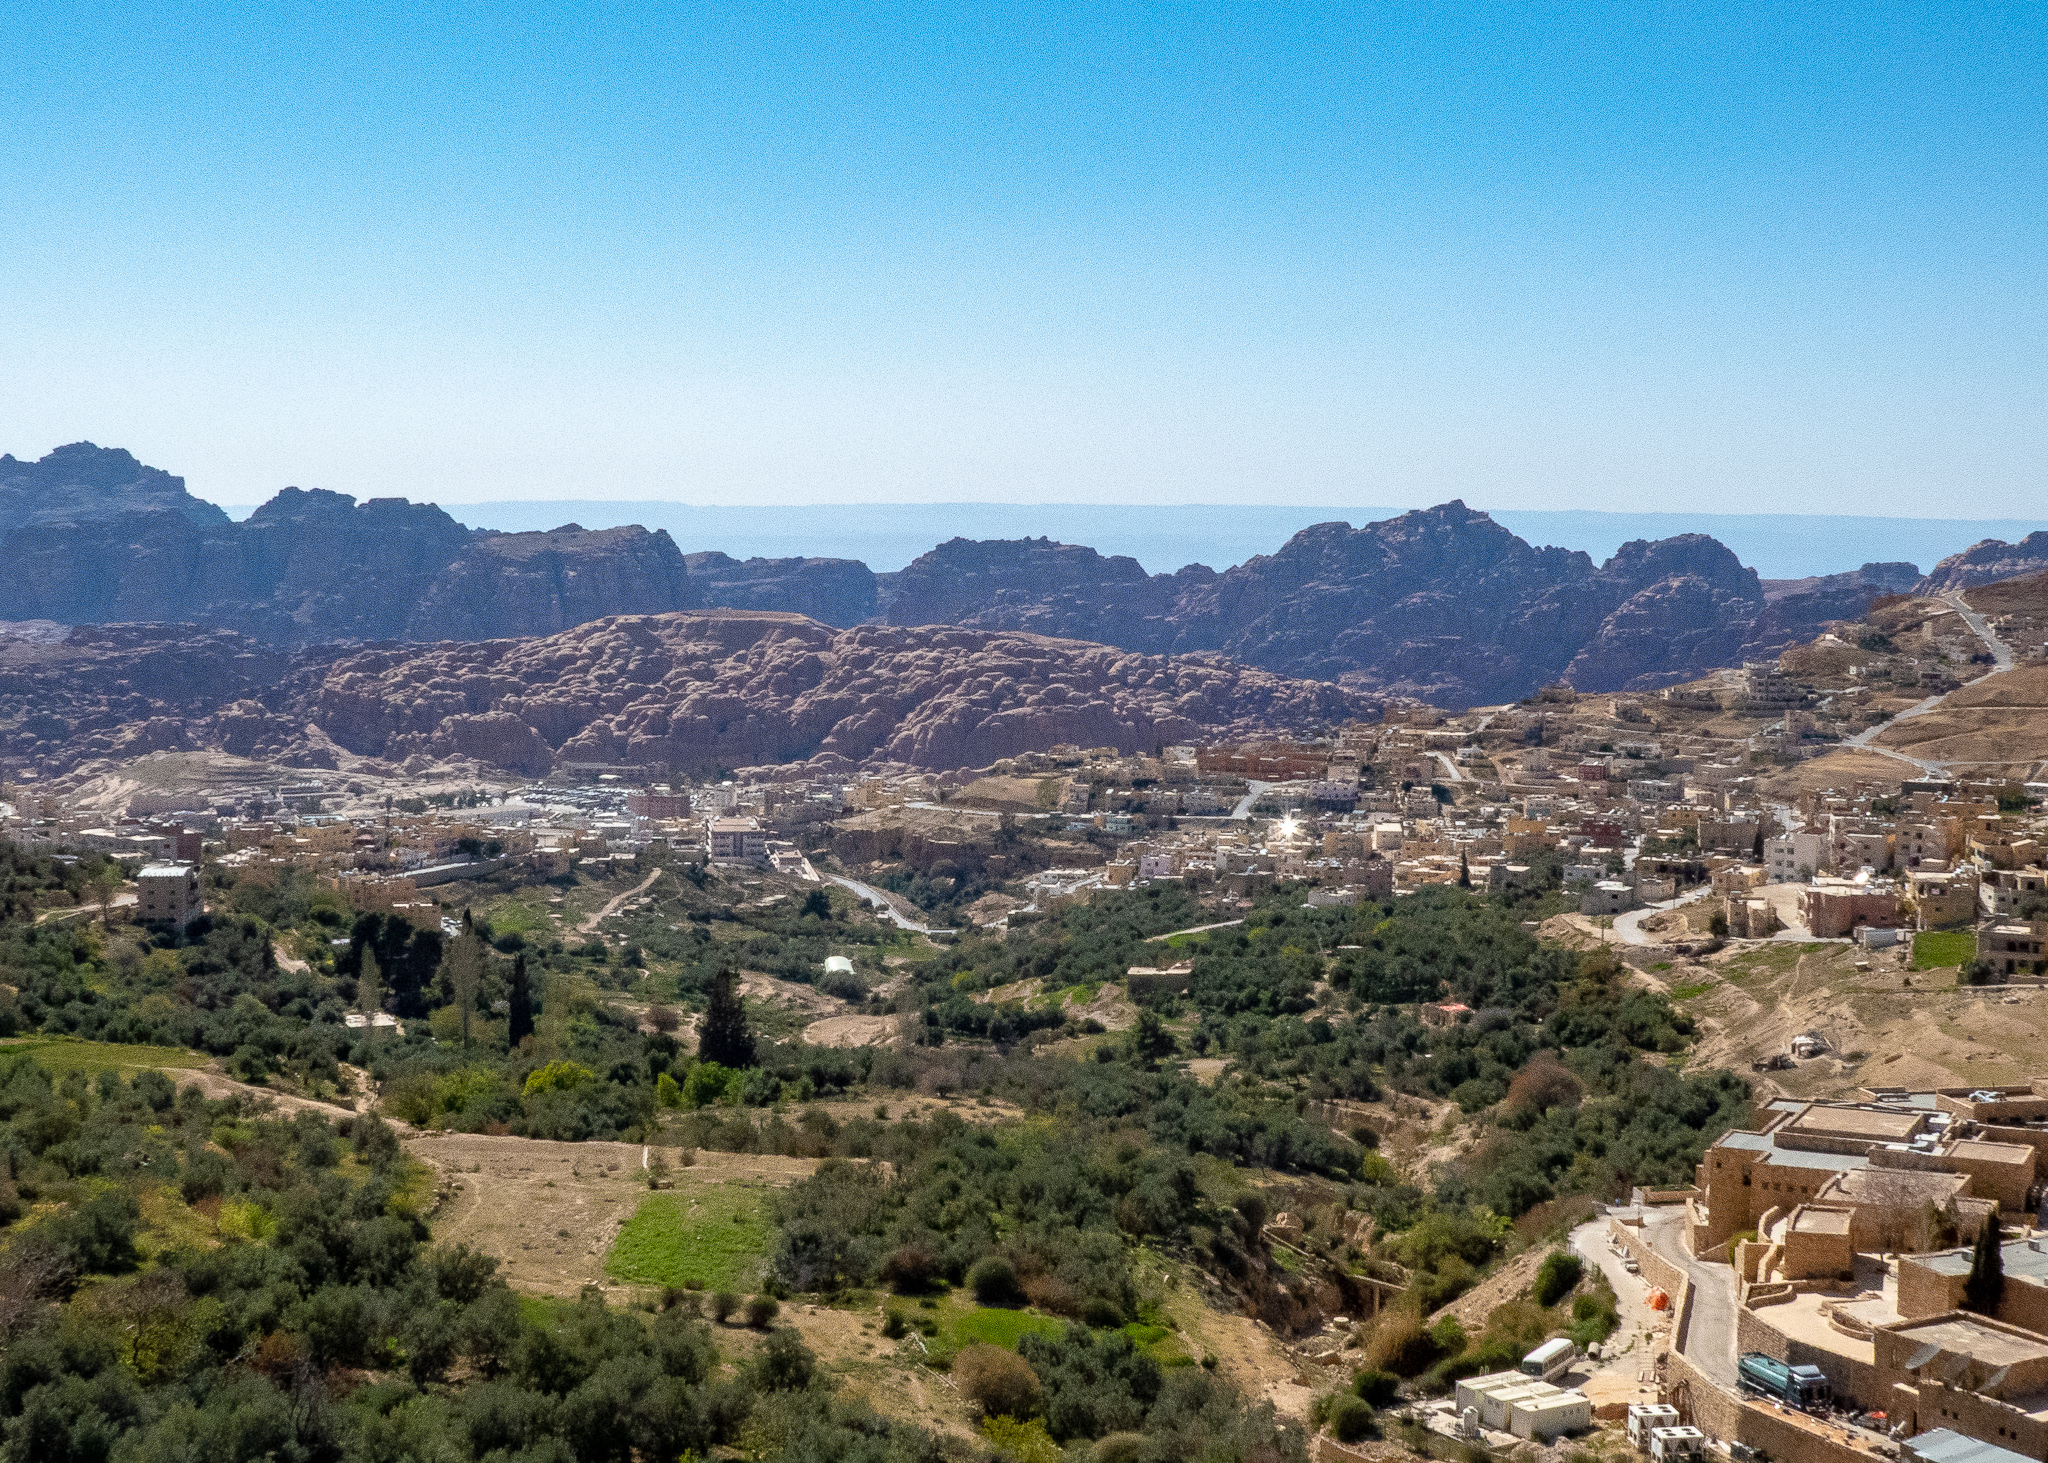 View down to Wadi Musa